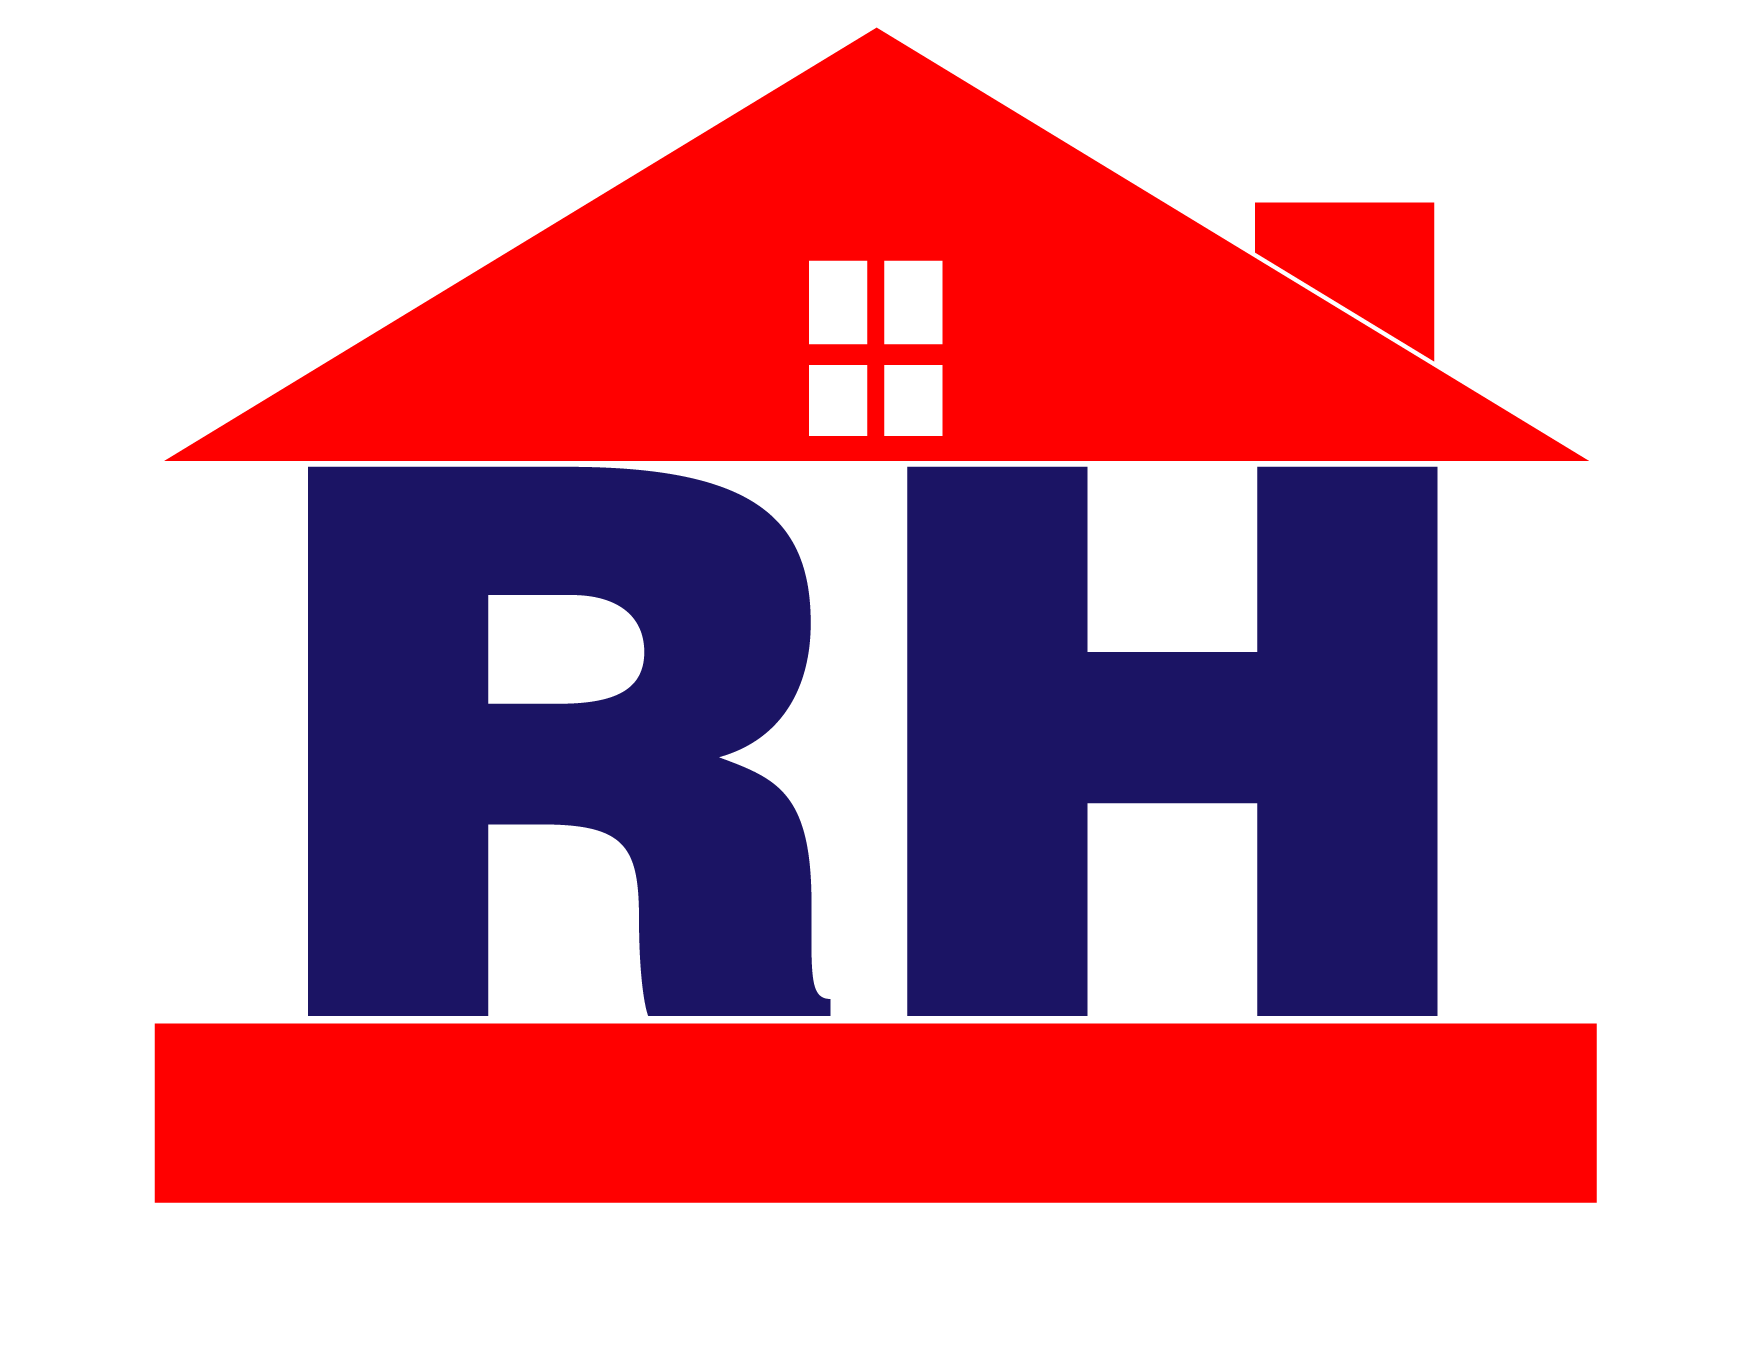 Red house logo design practice by deptirado on deviantart for Best house logo design